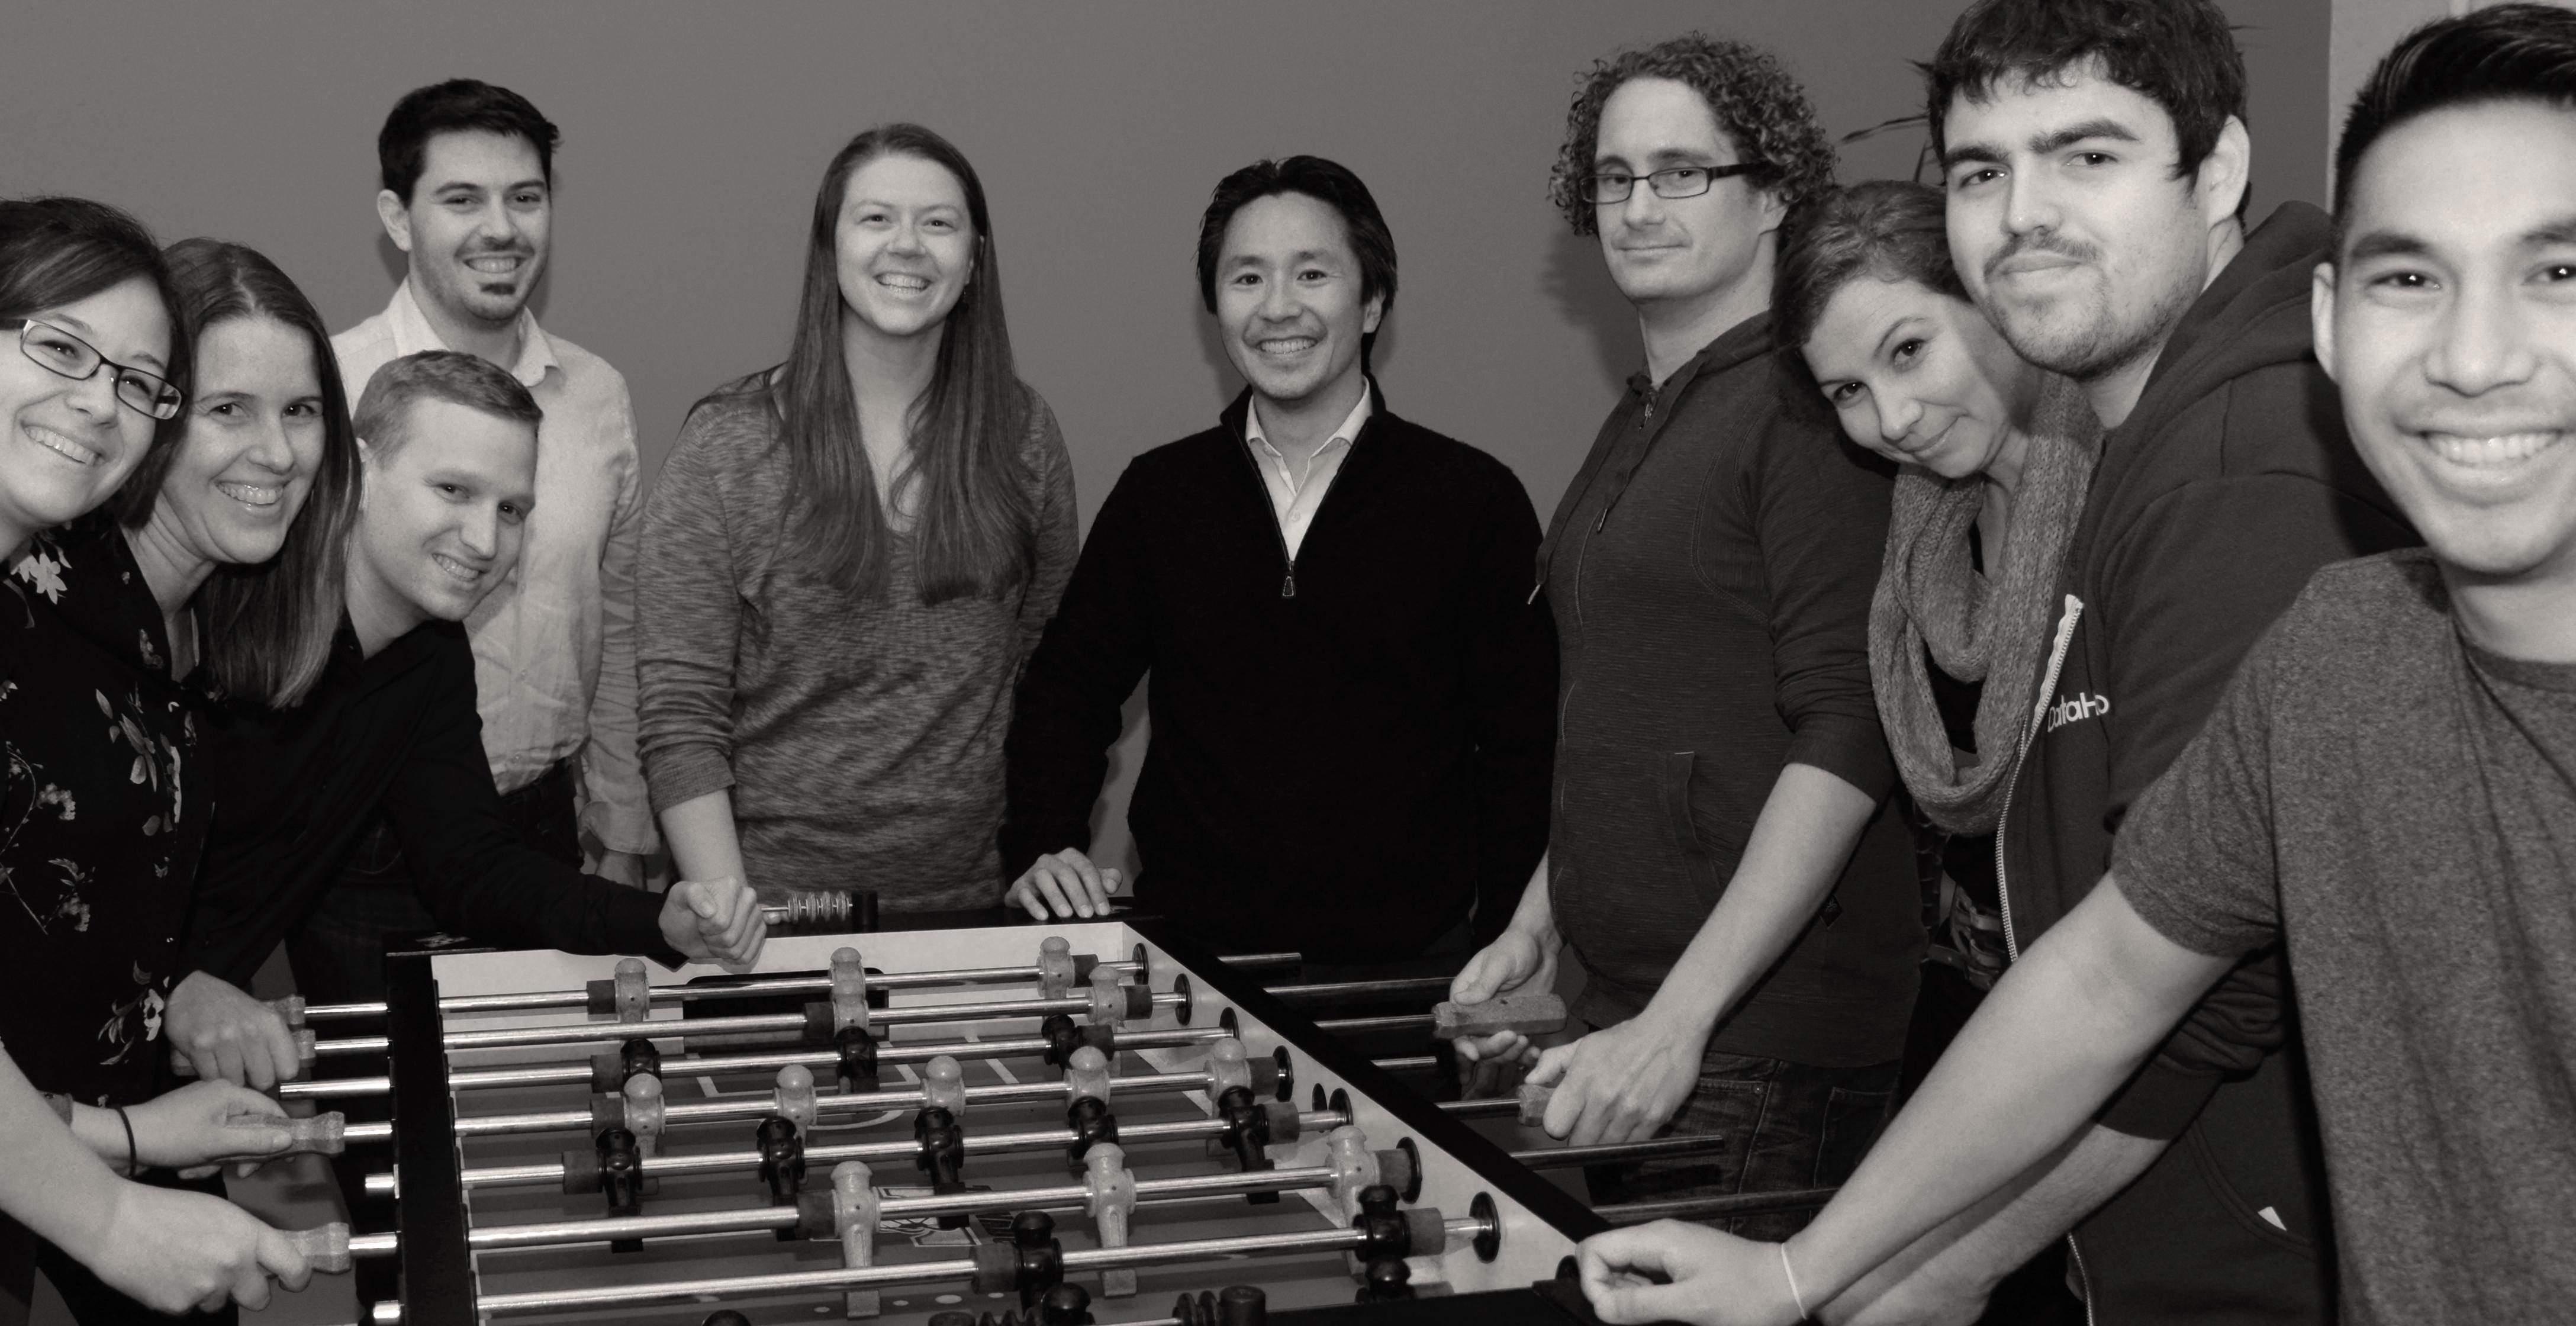 The DataHero team. Neumann is fourth from left.